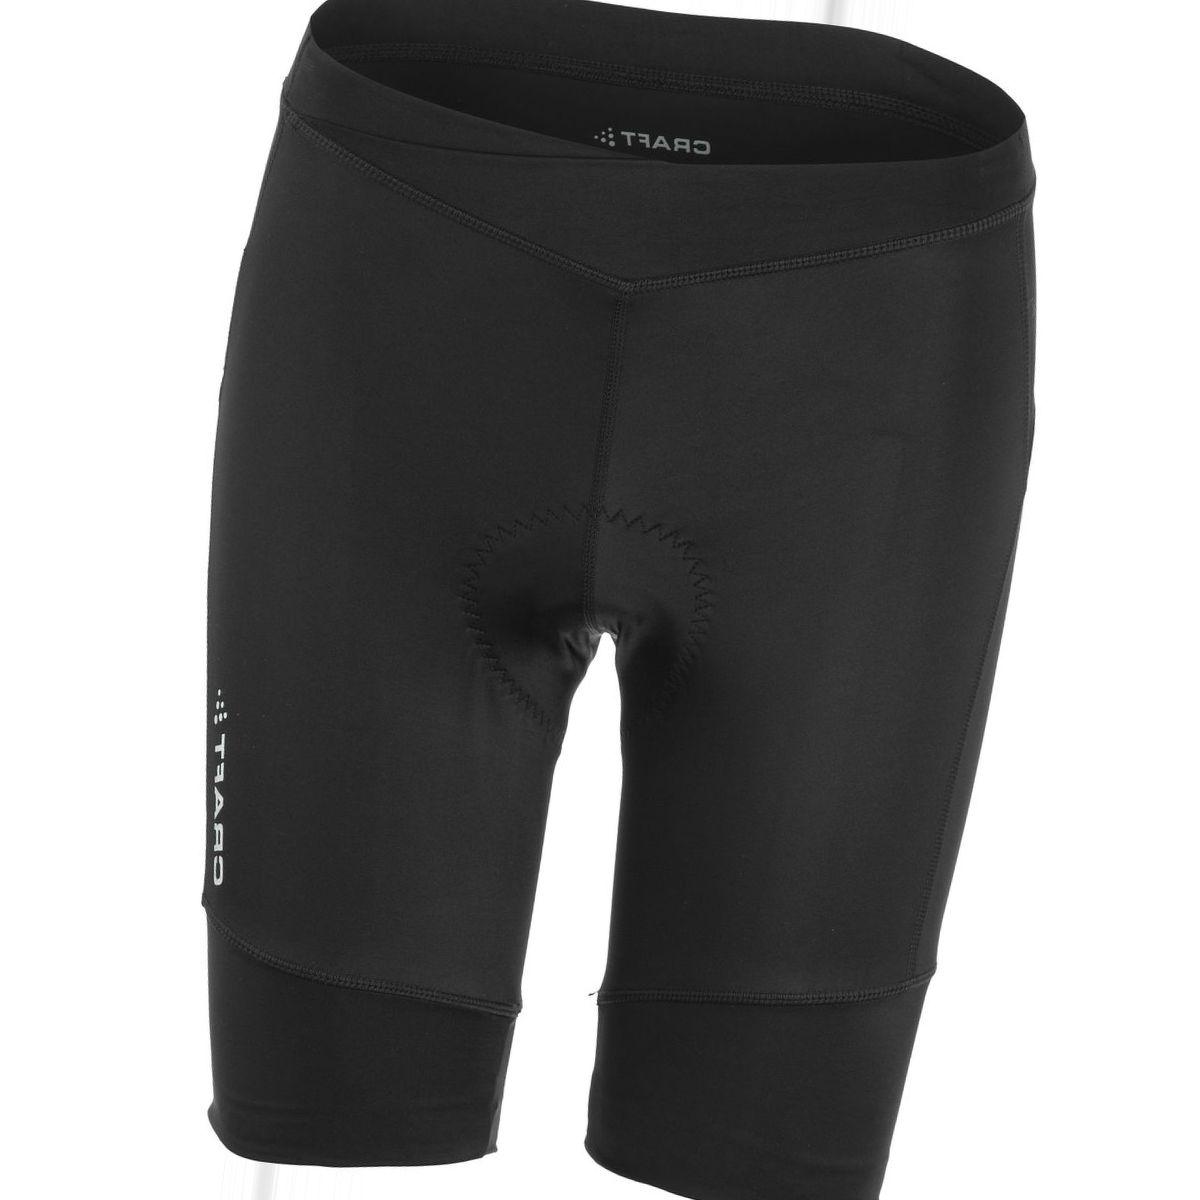 Craft Velo Shorts - Women's